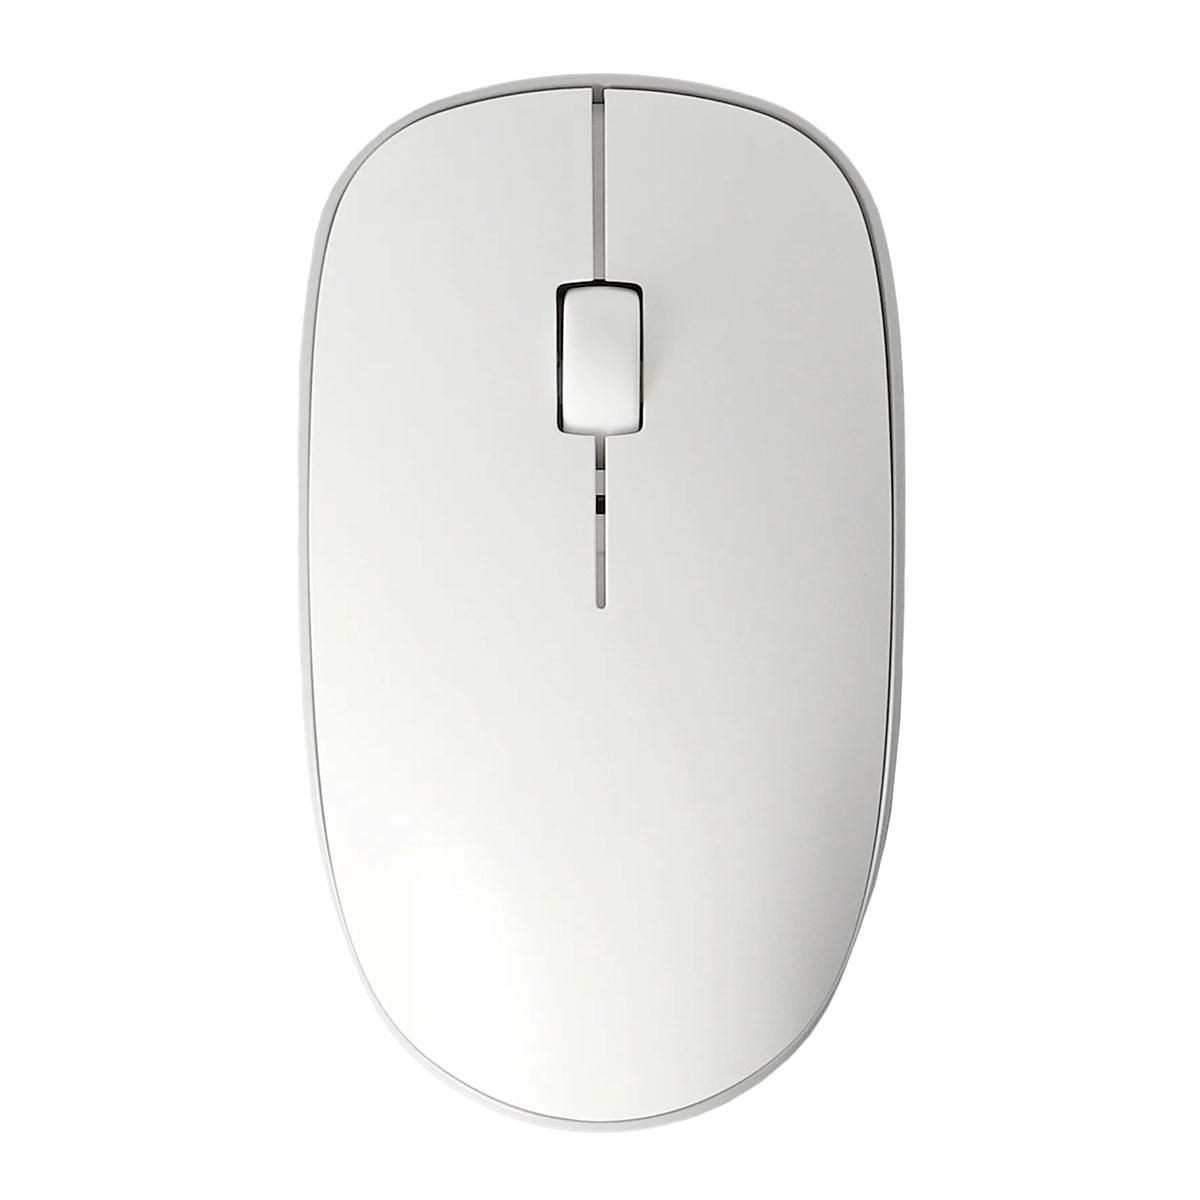 Mouse Rapoo M200 Silent, Wireless 2.4 GHz, Bluetooth, 1300 DPI, Clique Silencioso, Branco - RA012